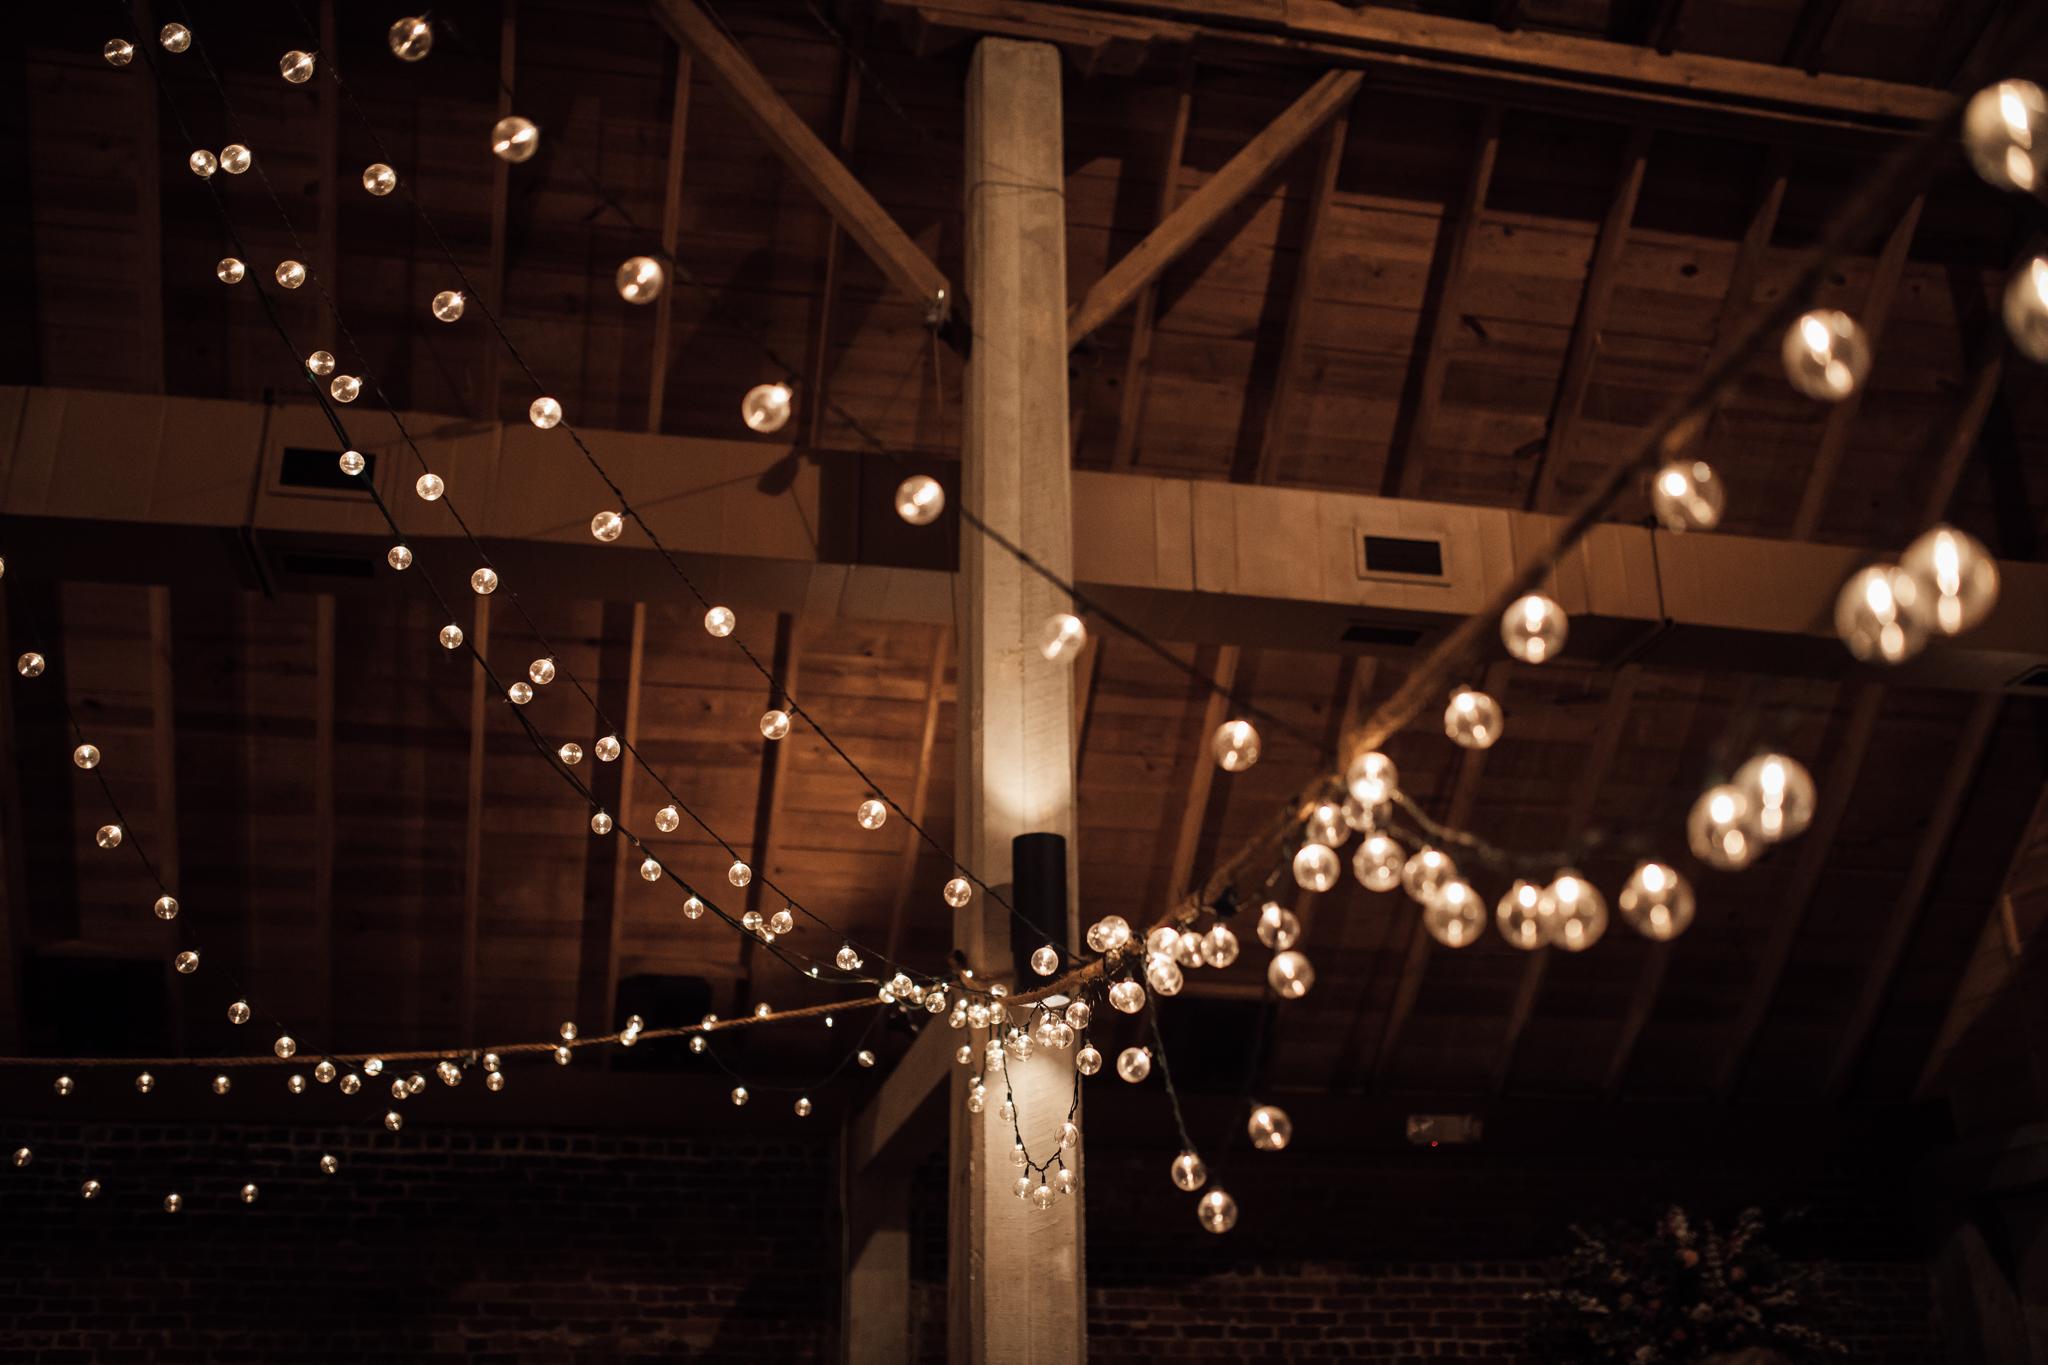 birmingham-alabama-wedding-photographer-laura-terry-the-warmth-around-you (83 of 110).jpg